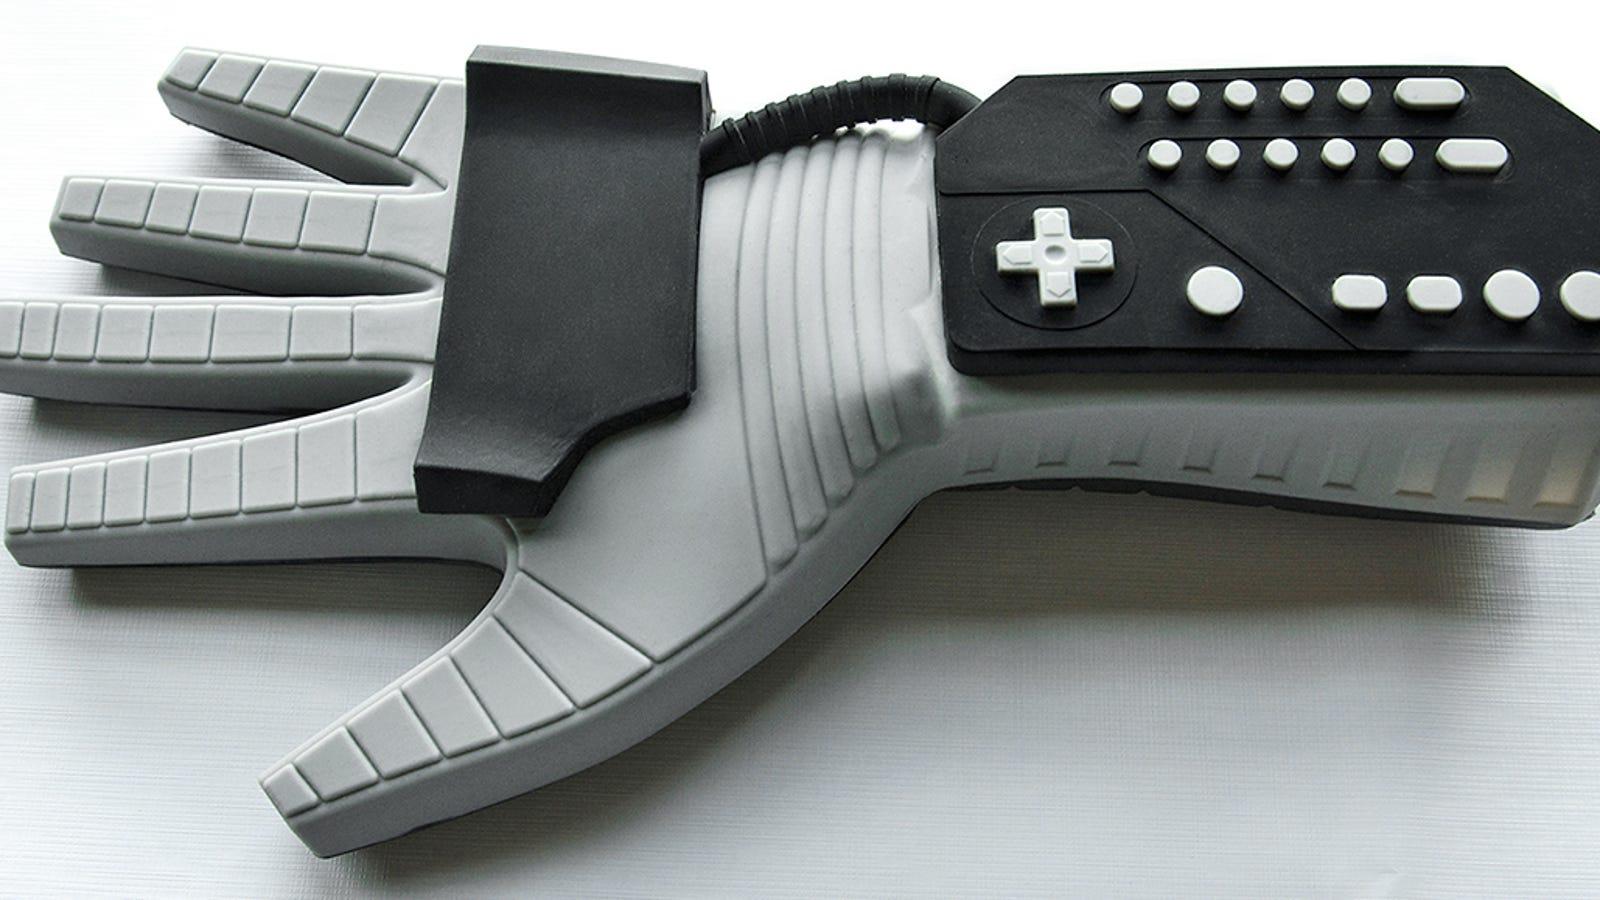 Fami-complex: Repairing The Power Glove - Part 1